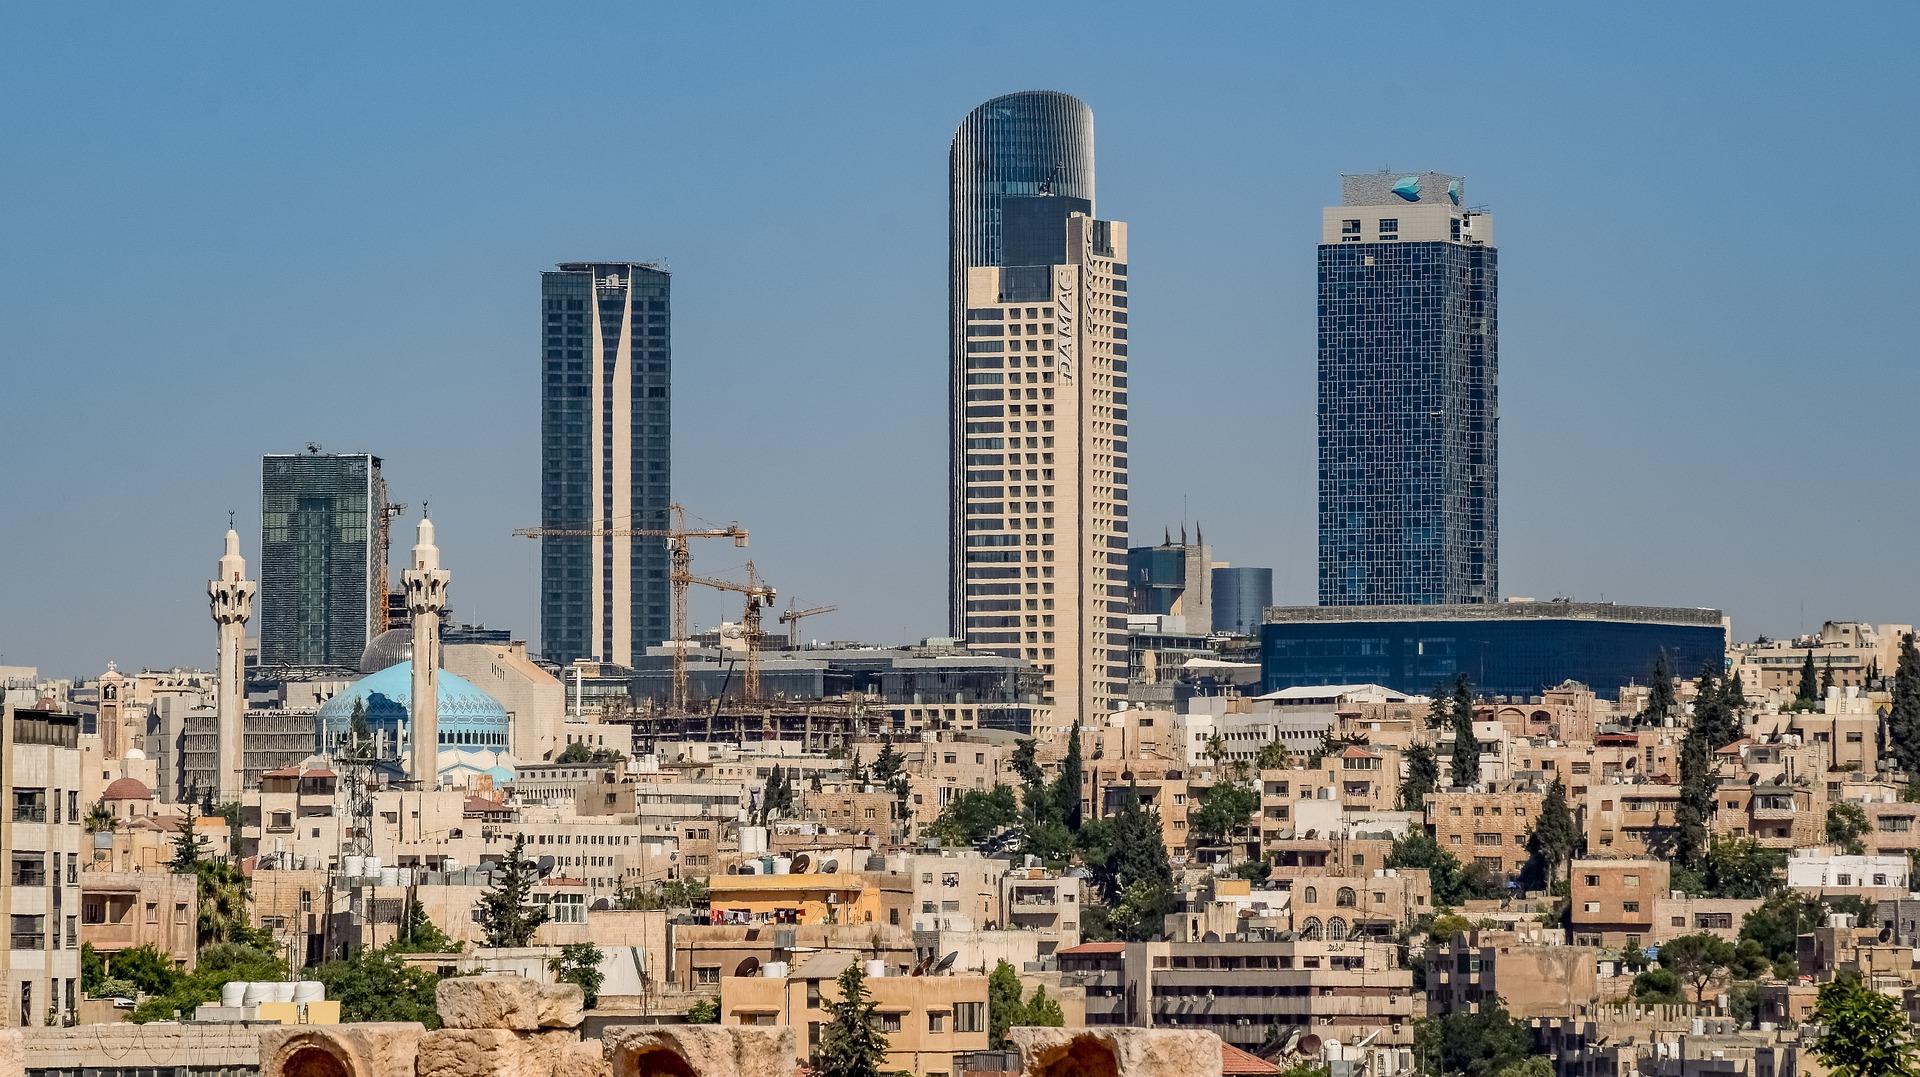 jordan country capital